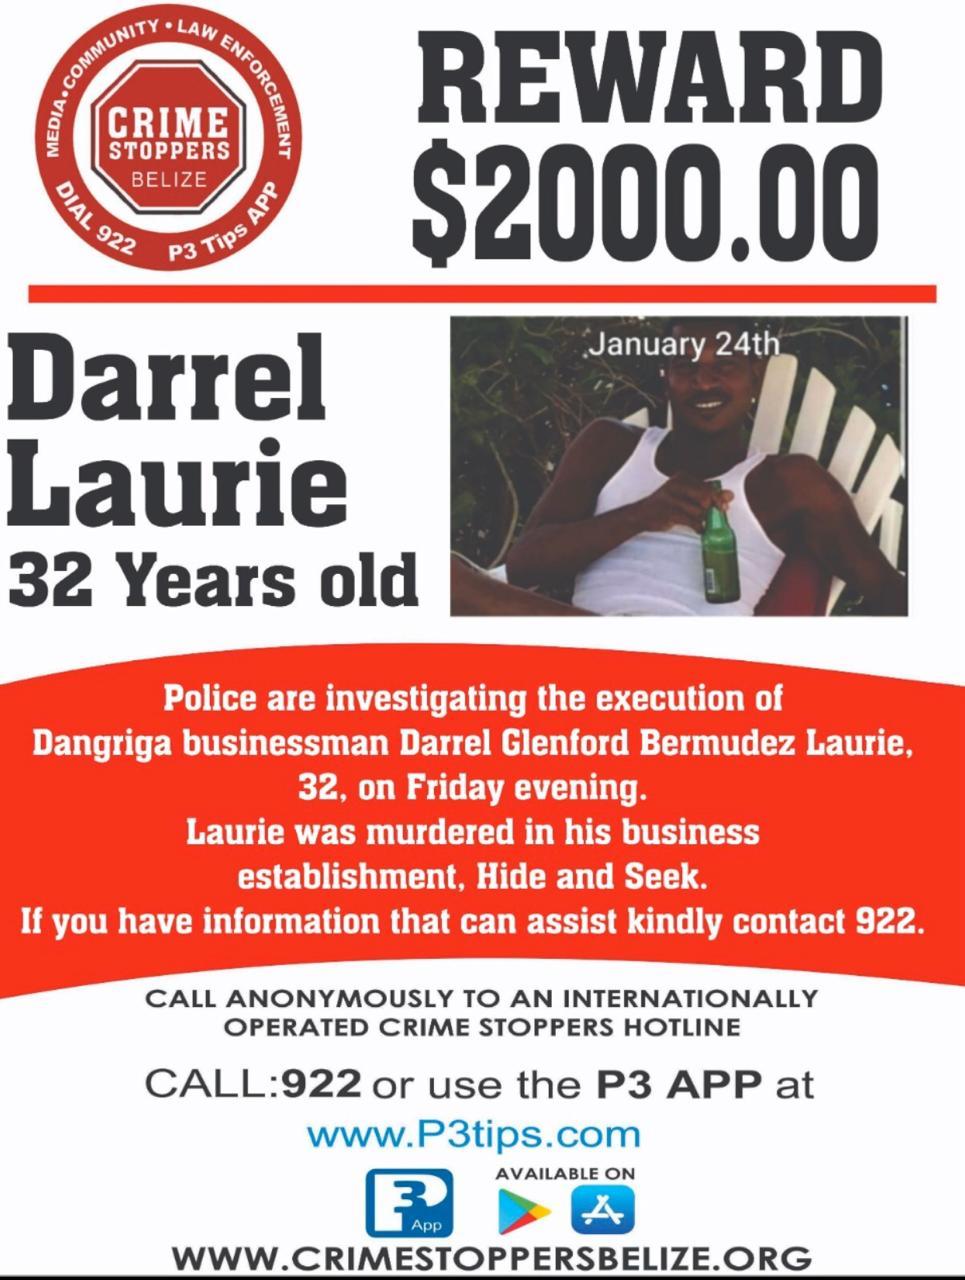 Darrel Laurie